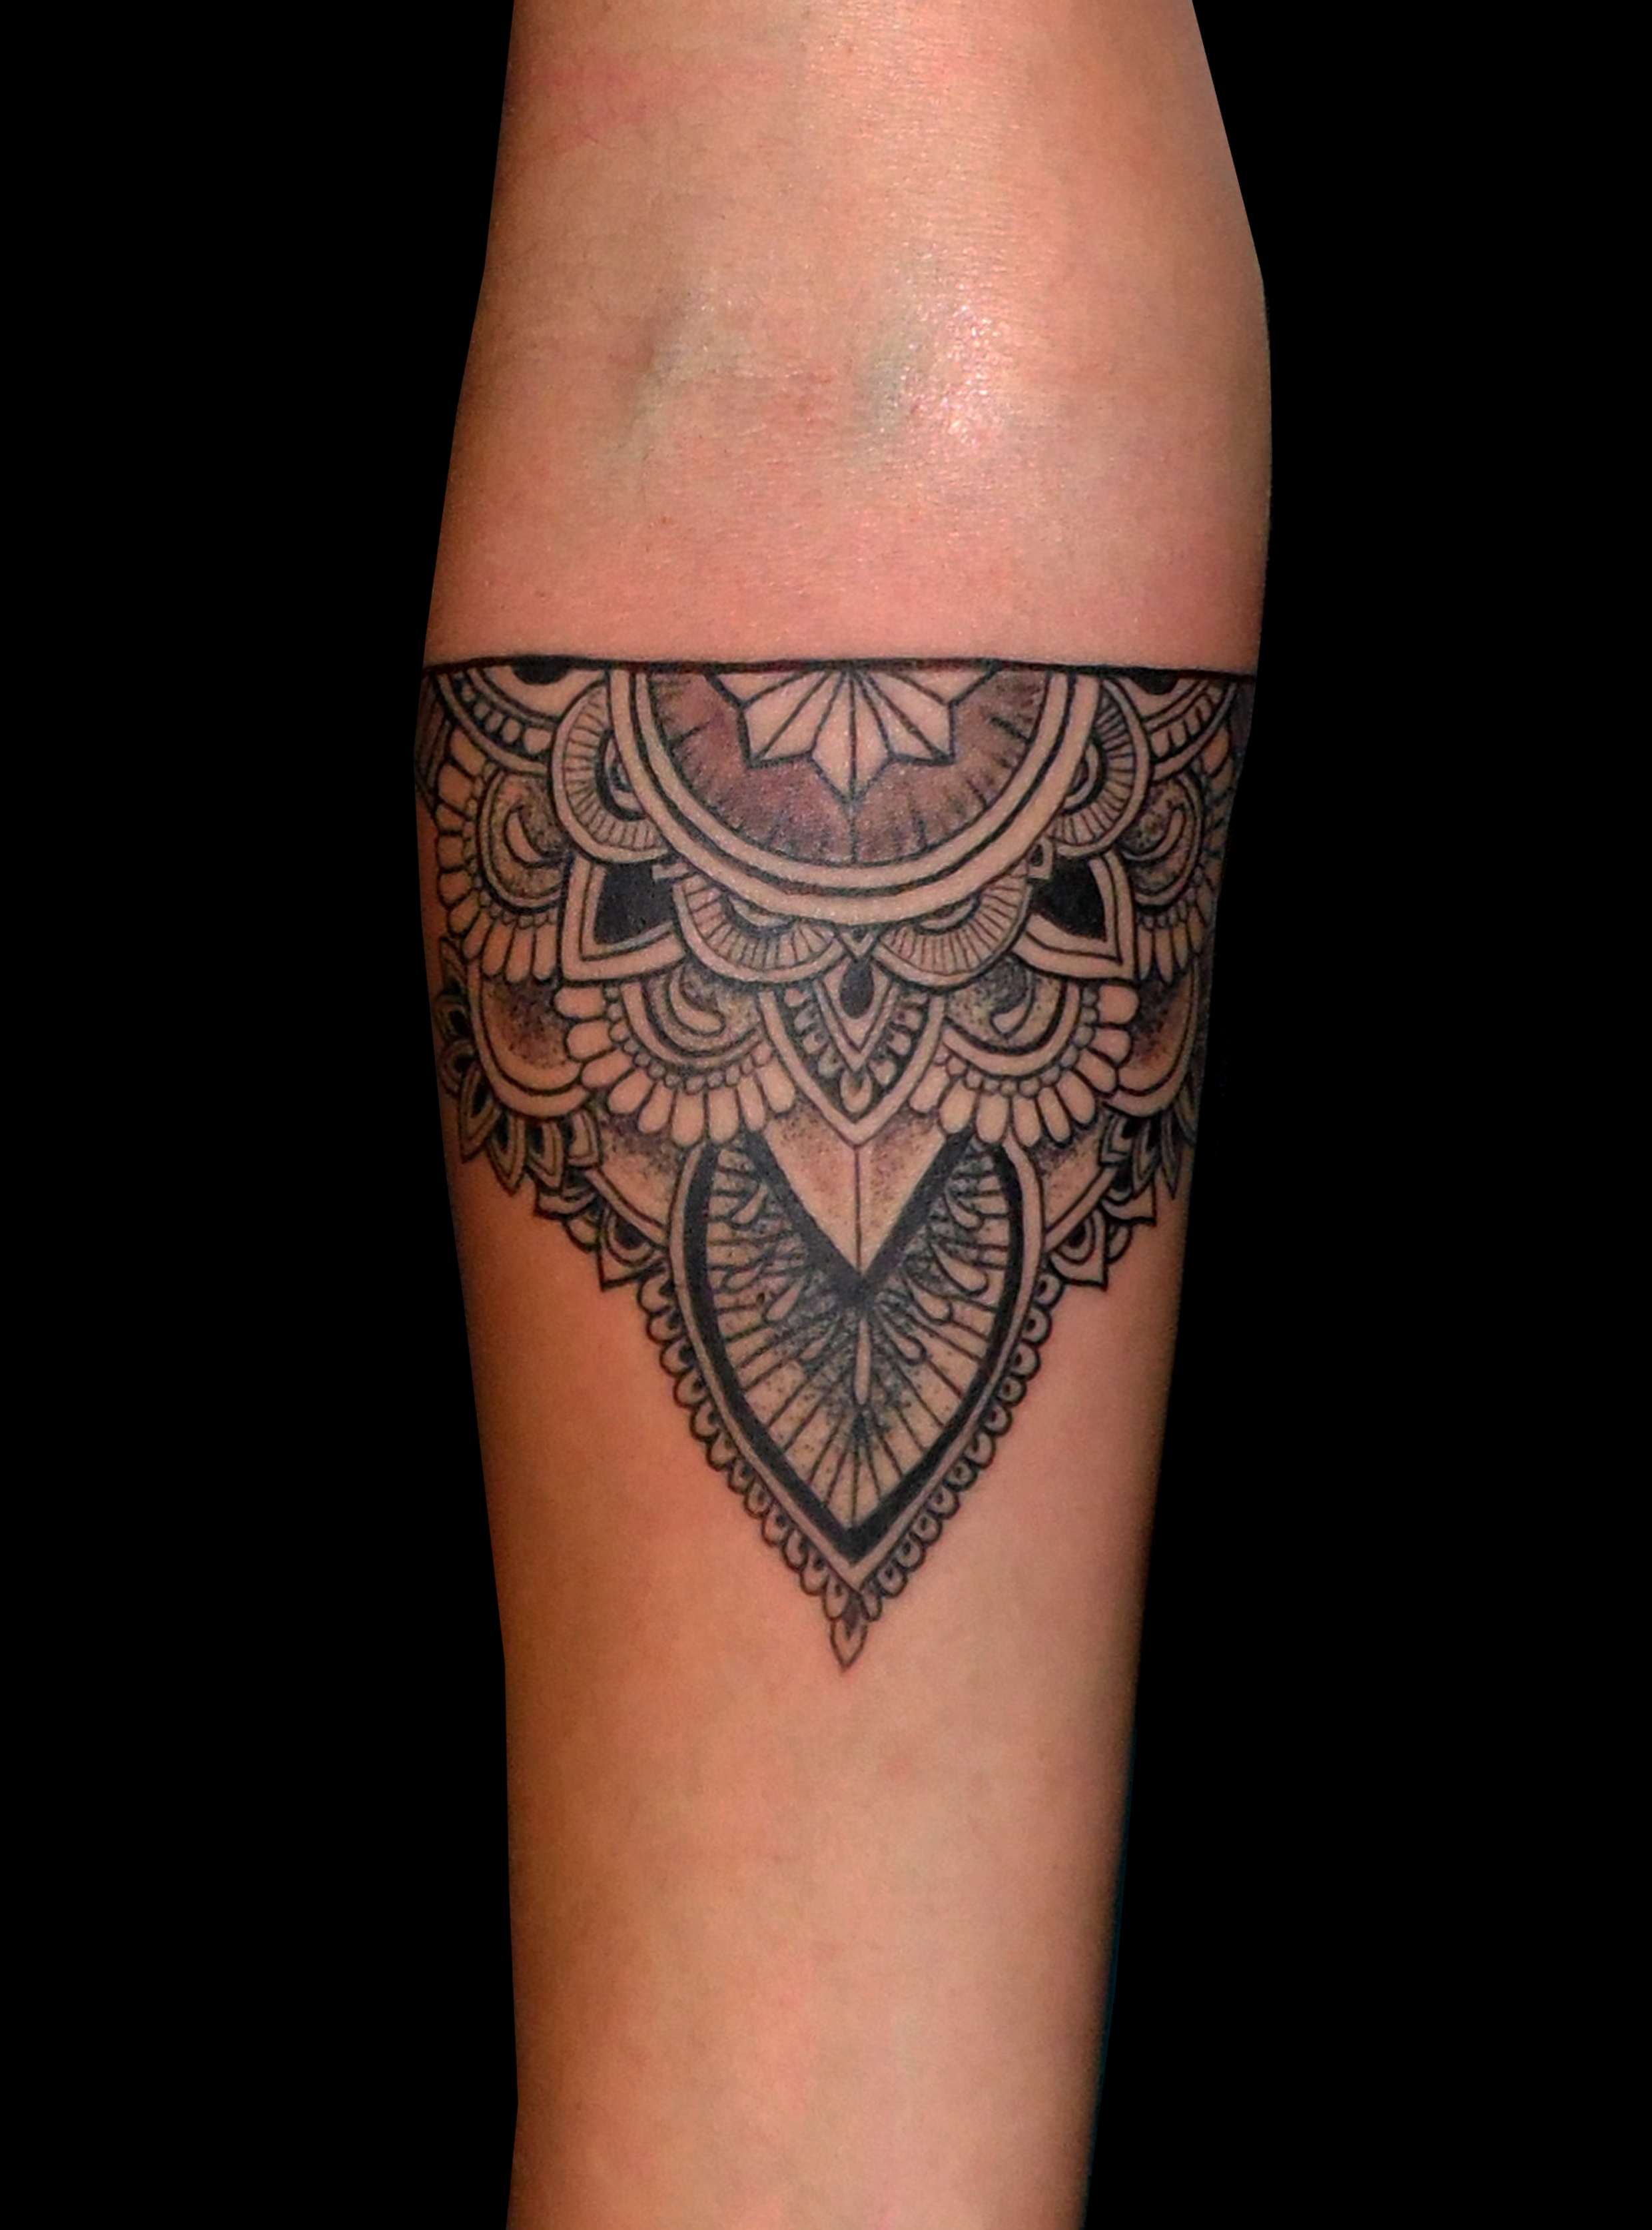 galer a tatuajes 13depicas tattoo. Black Bedroom Furniture Sets. Home Design Ideas